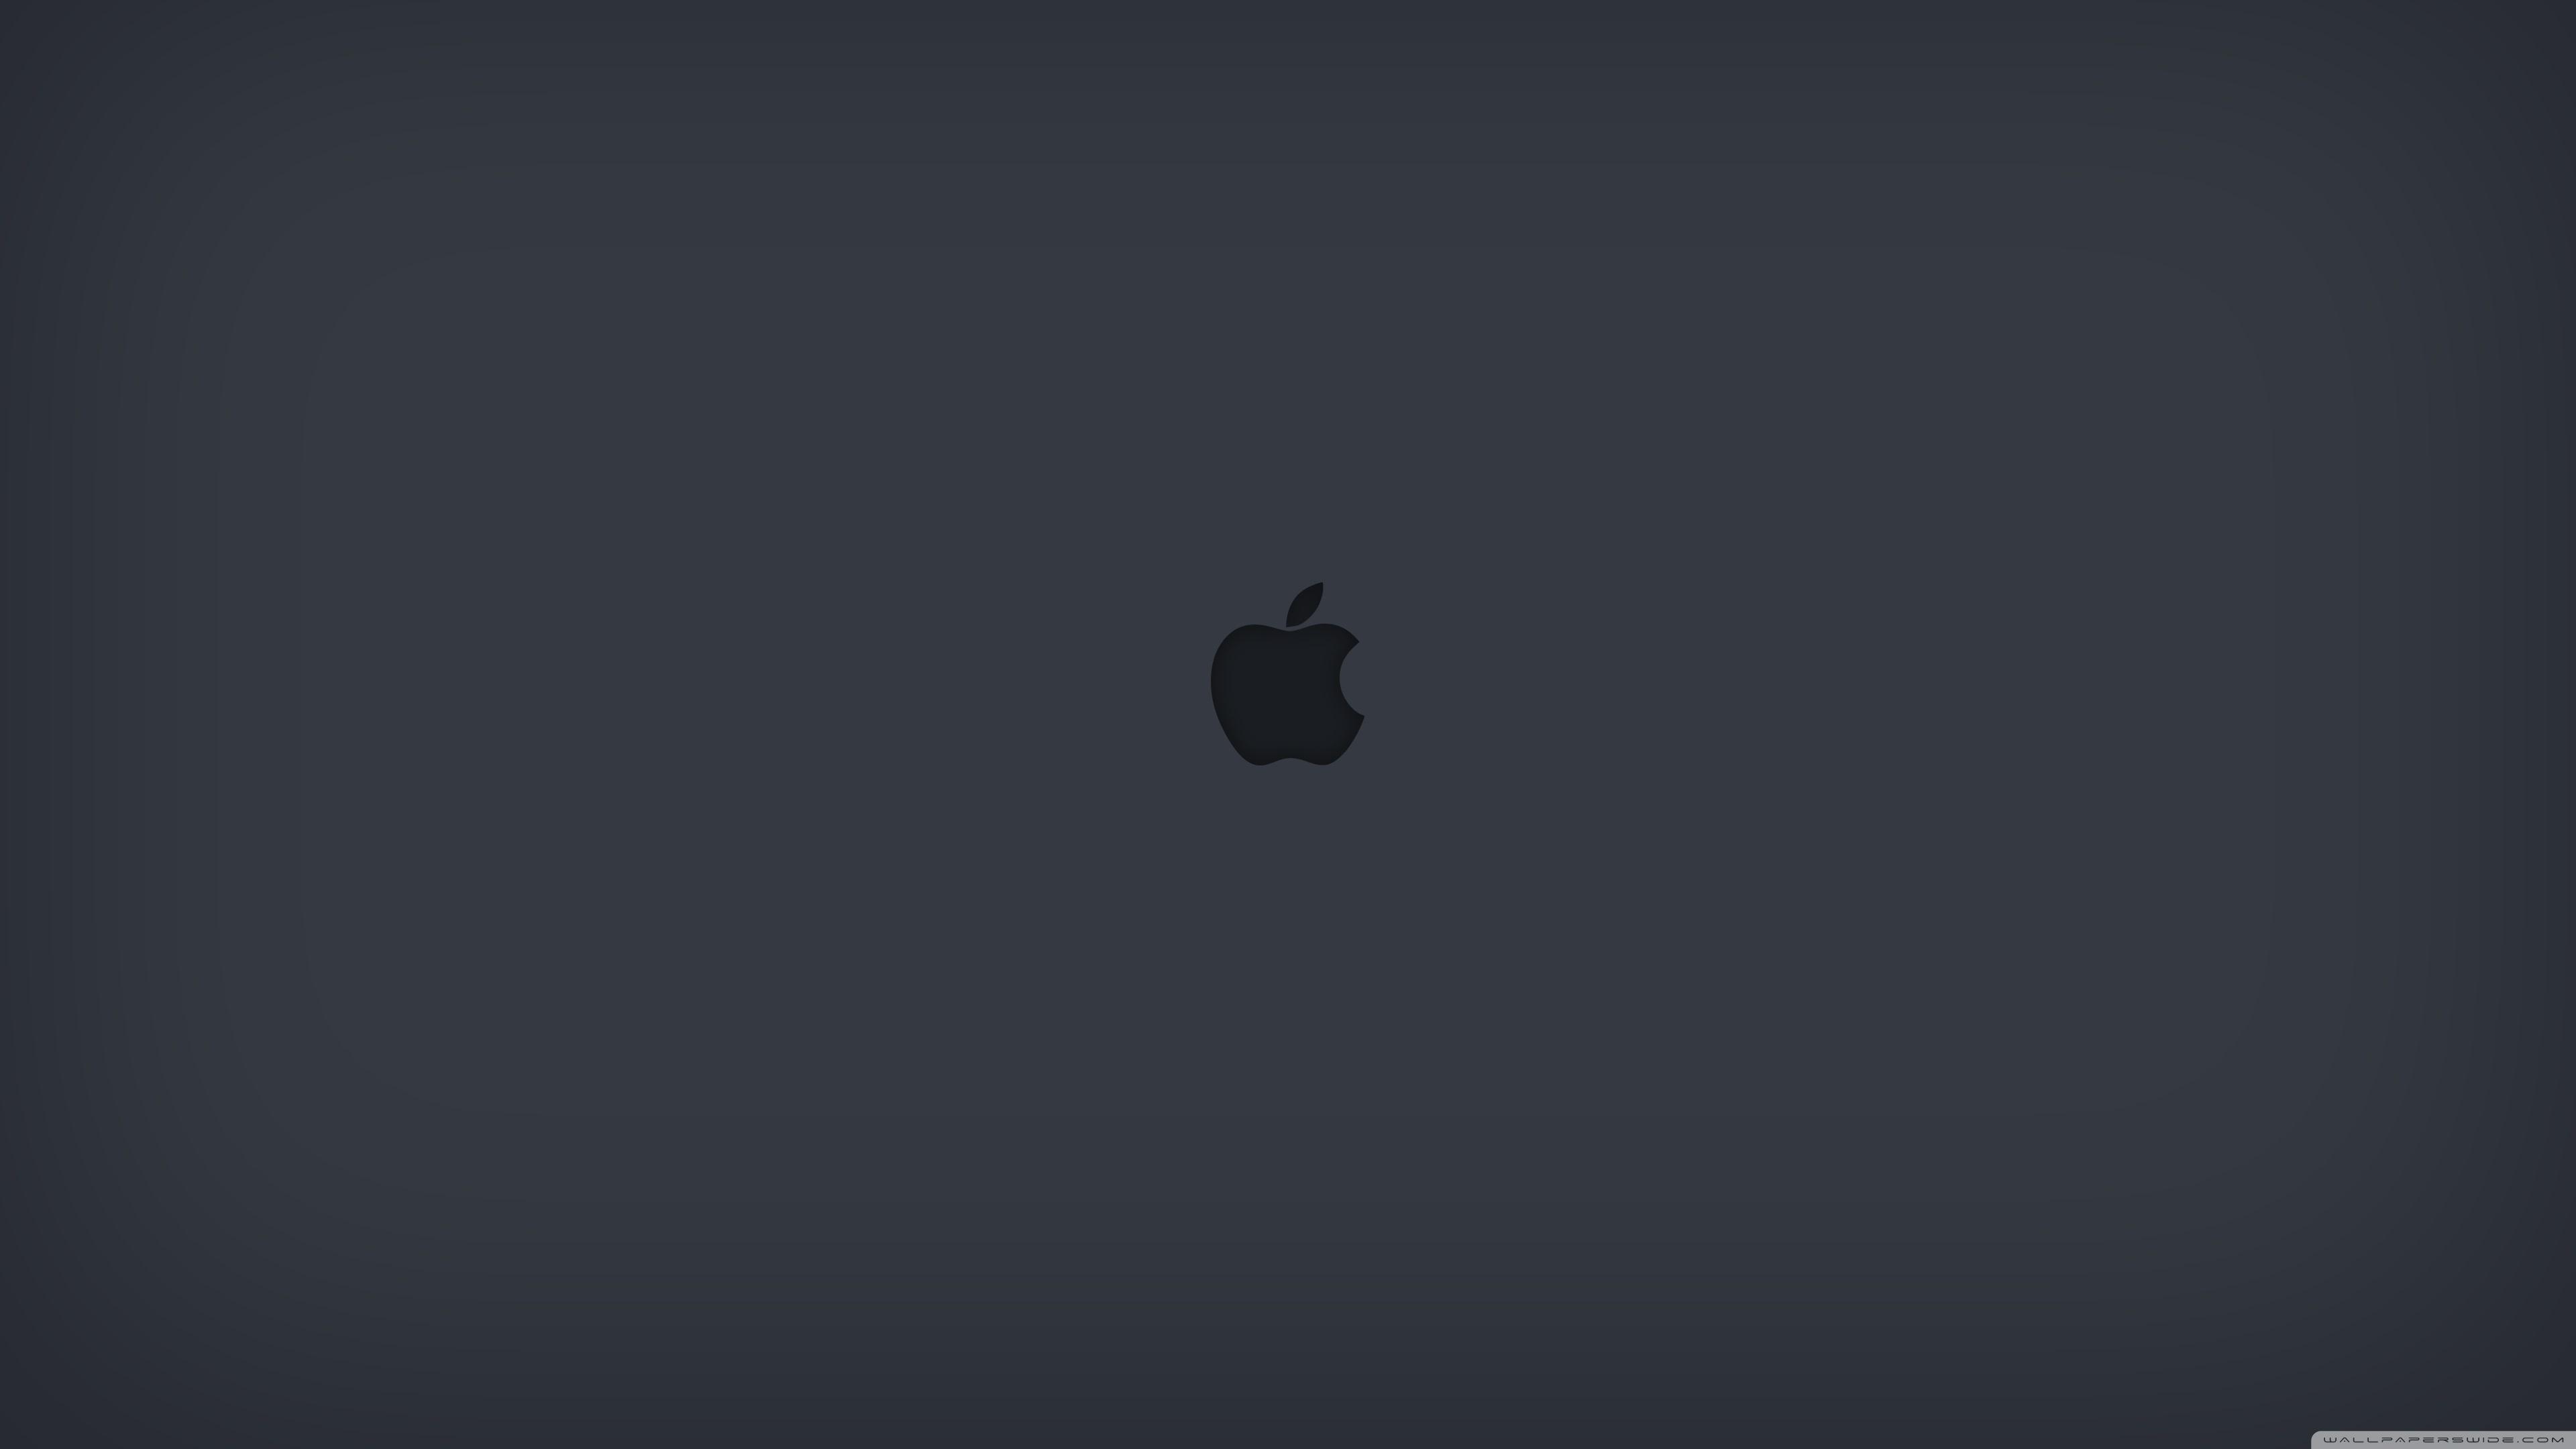 Apple 4k Wallpapers Wallpaper Cave